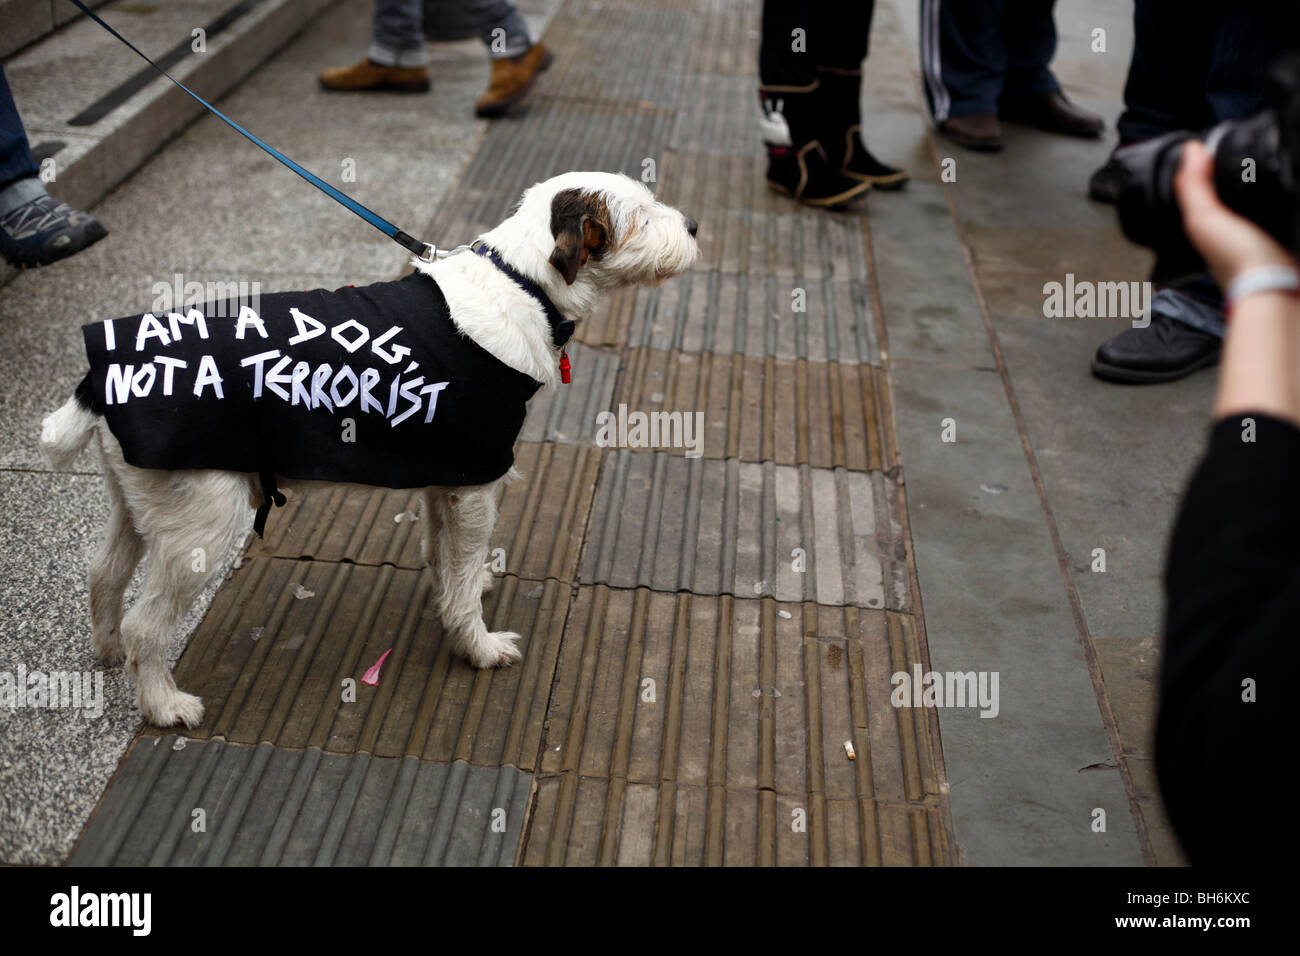 I am a photographer not a terrorist mass photo gathering at Trafalgar Square, London  23 Jan 2010 - Stock Image